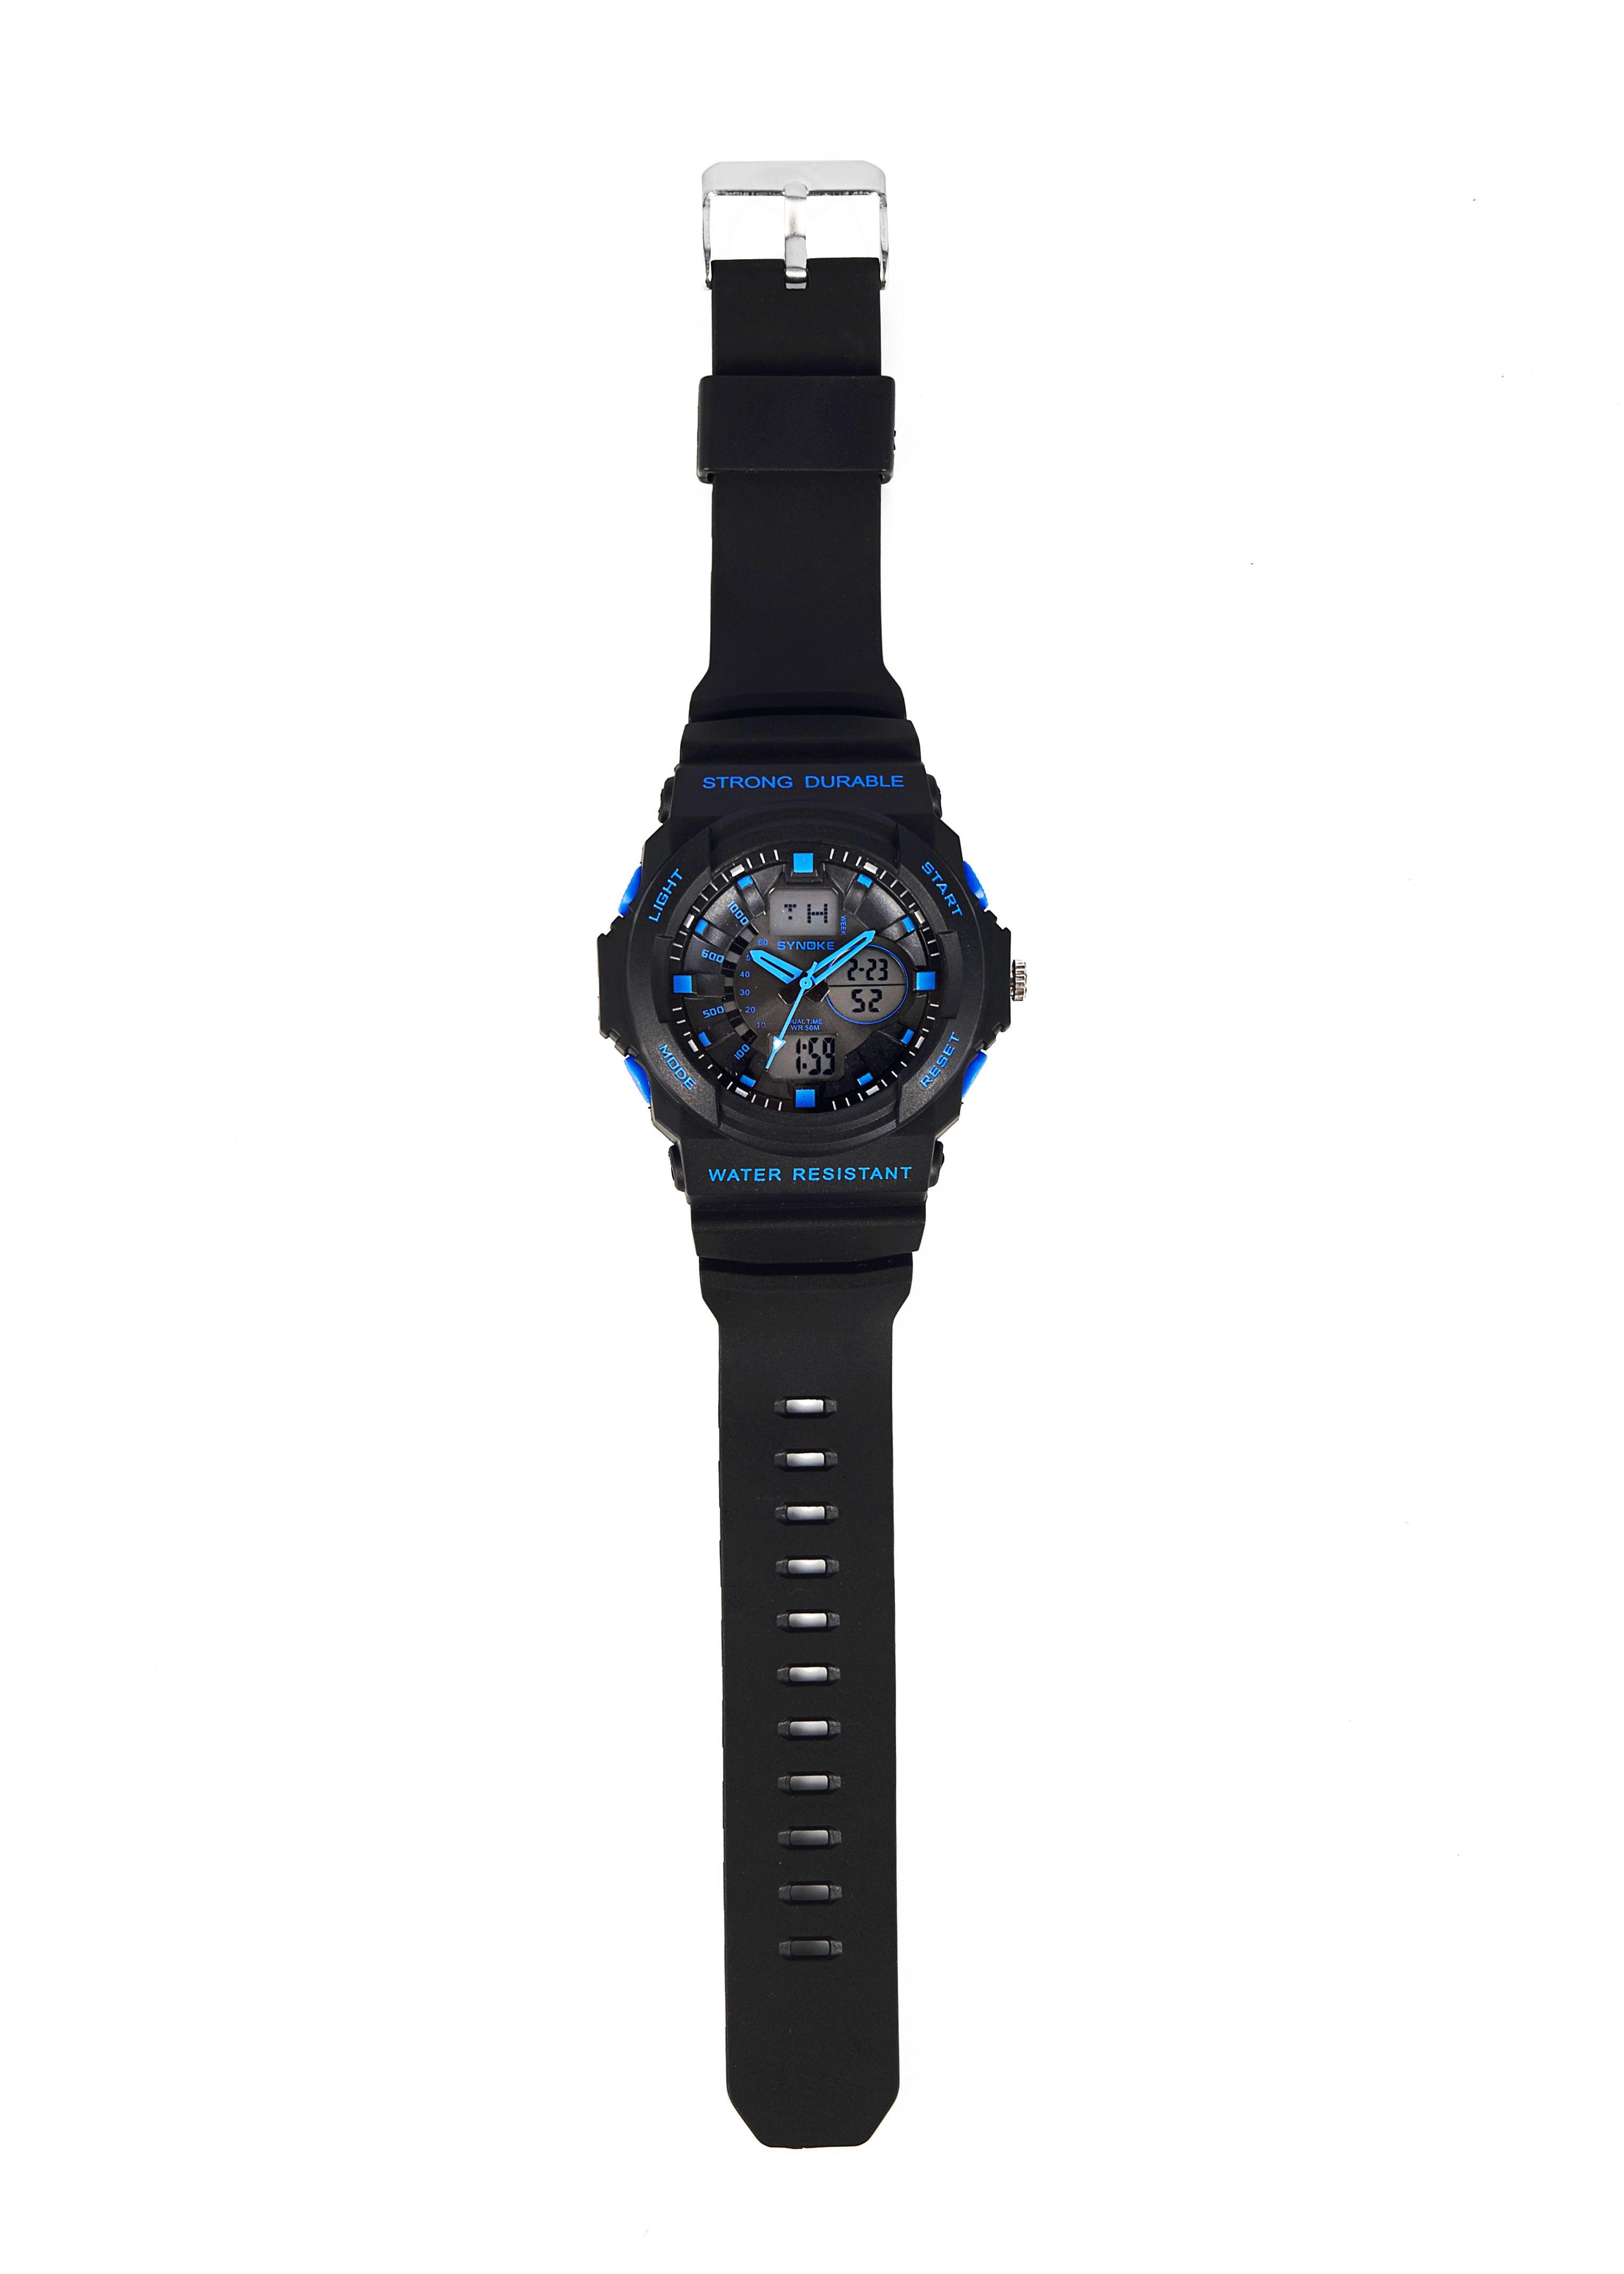 Moda PU Correa de cuero Hombres Relojes impermeables Dial redondo Deporte LED Reloj de cuarzo digital para regalo